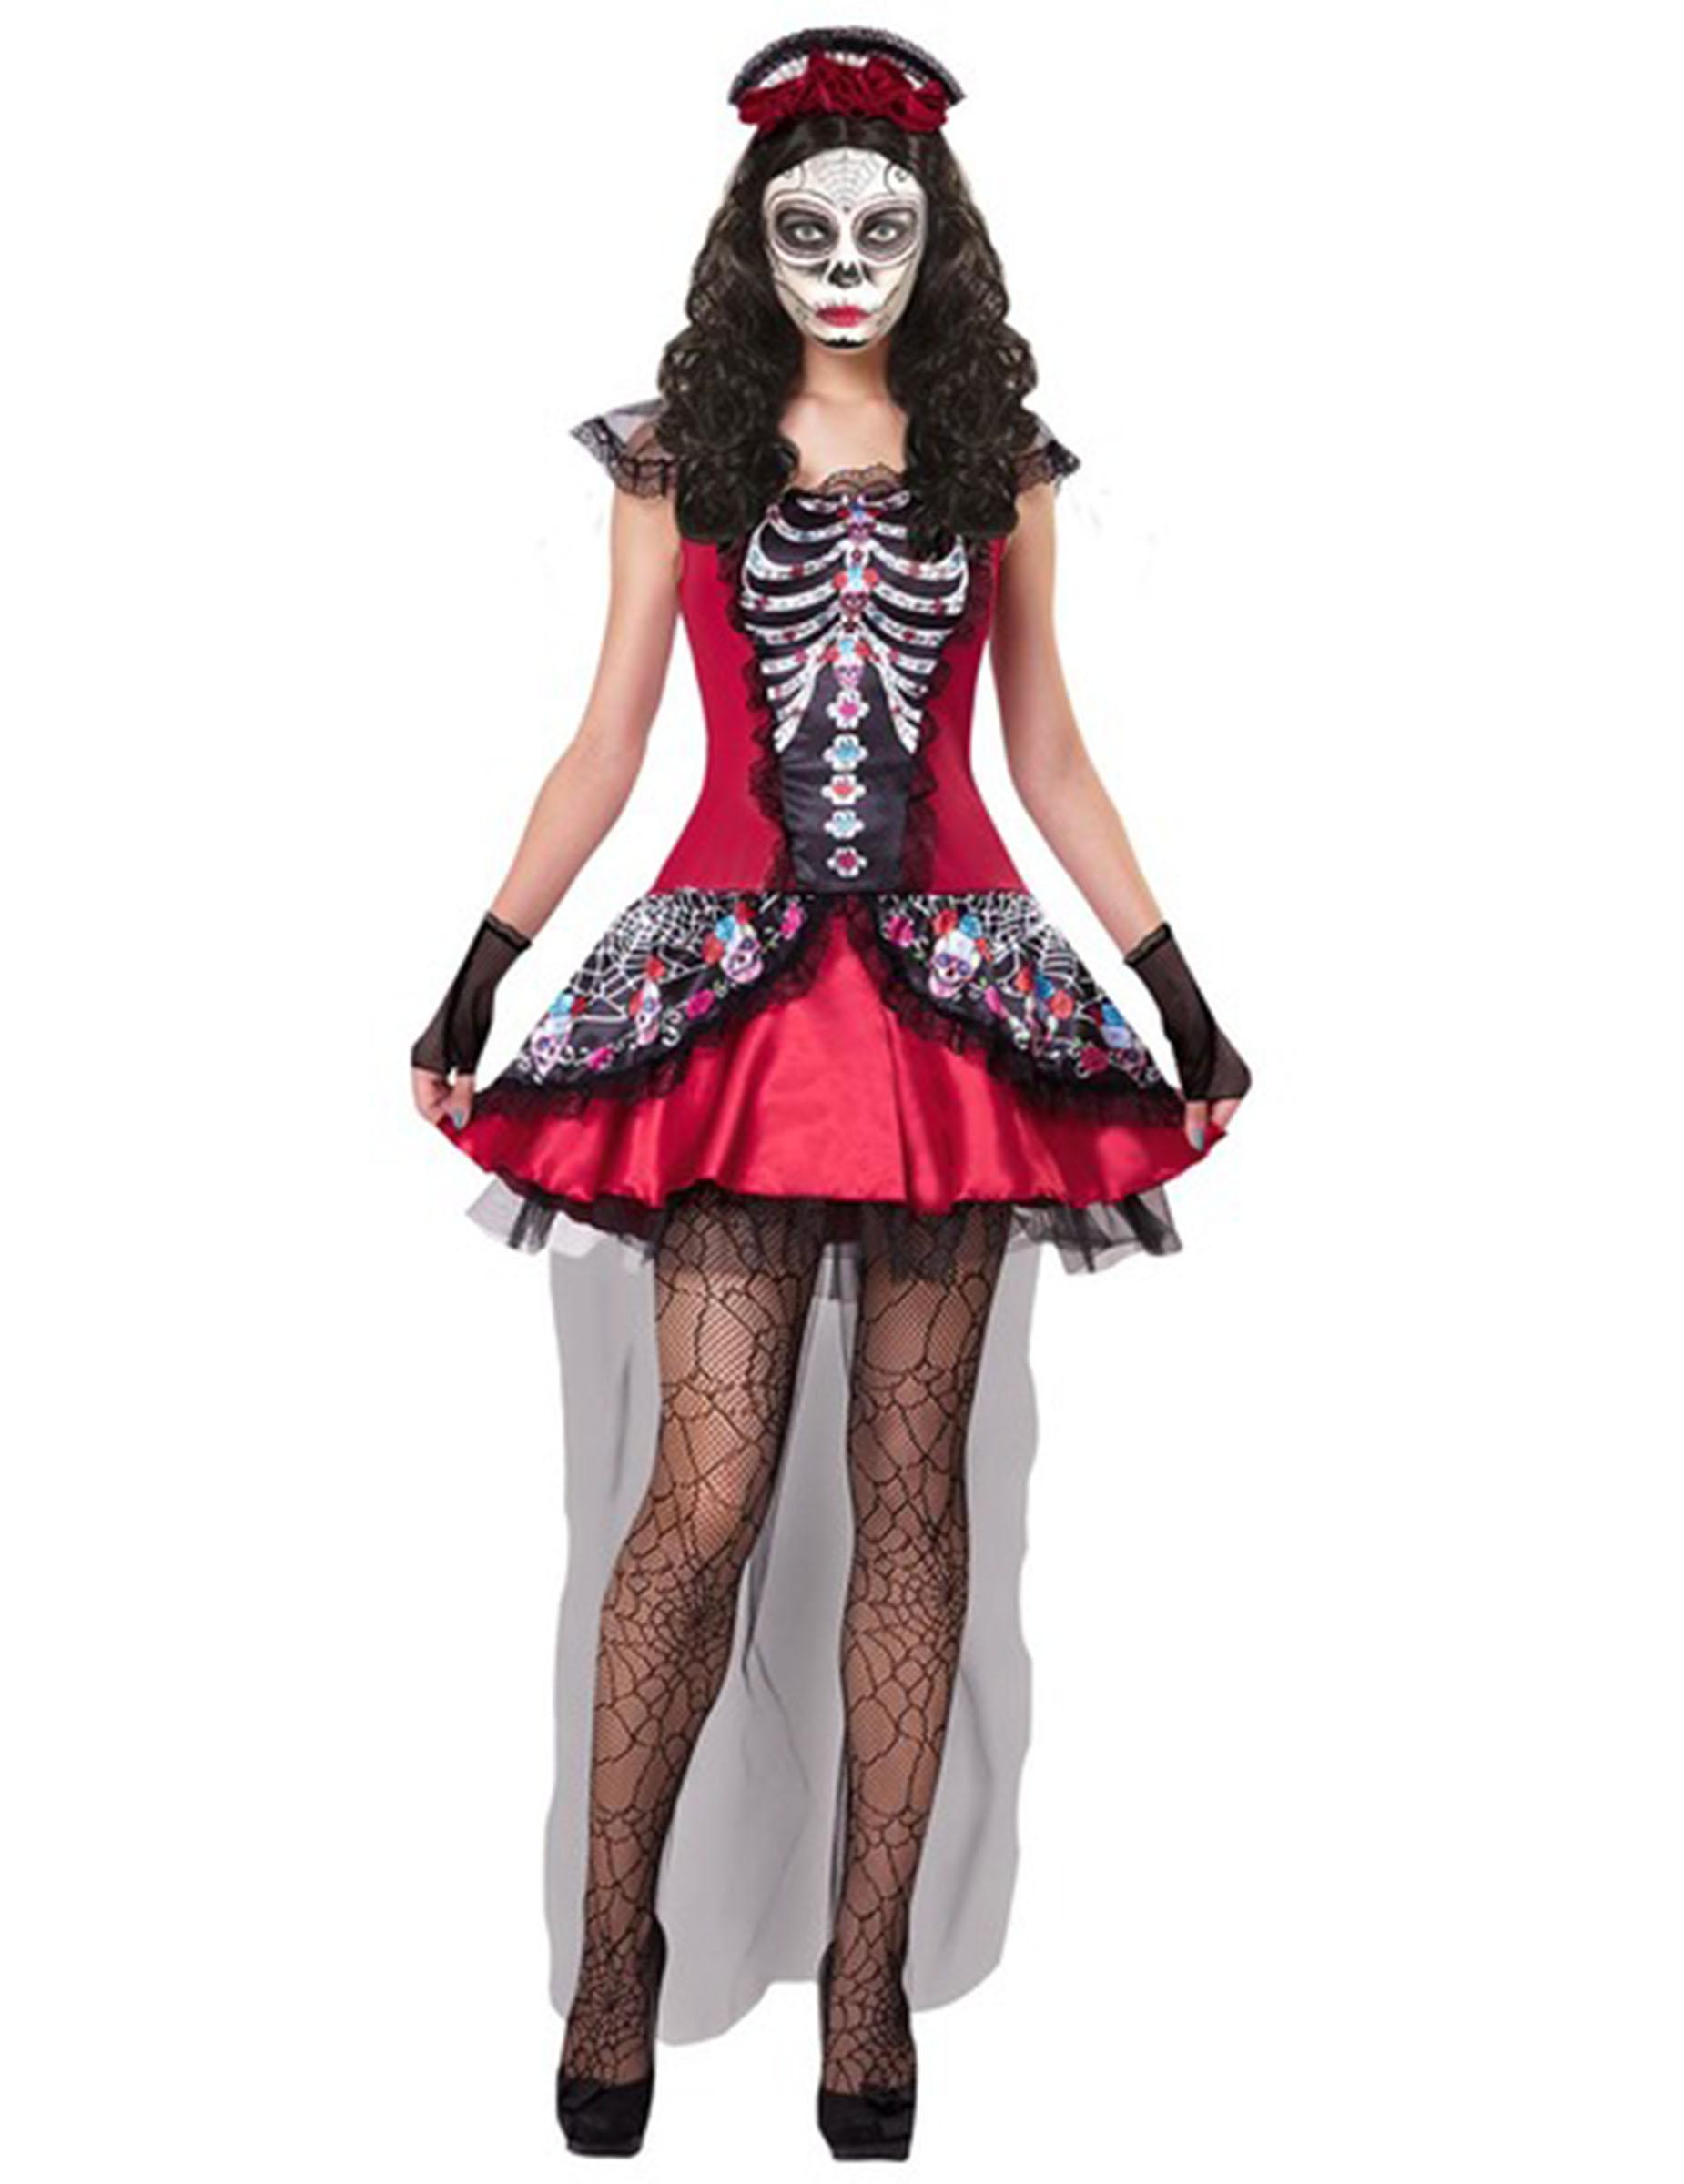 Costume da scheletro multicolore per donna dia de los muertos  Costumi  adulti 6c7d84c7532